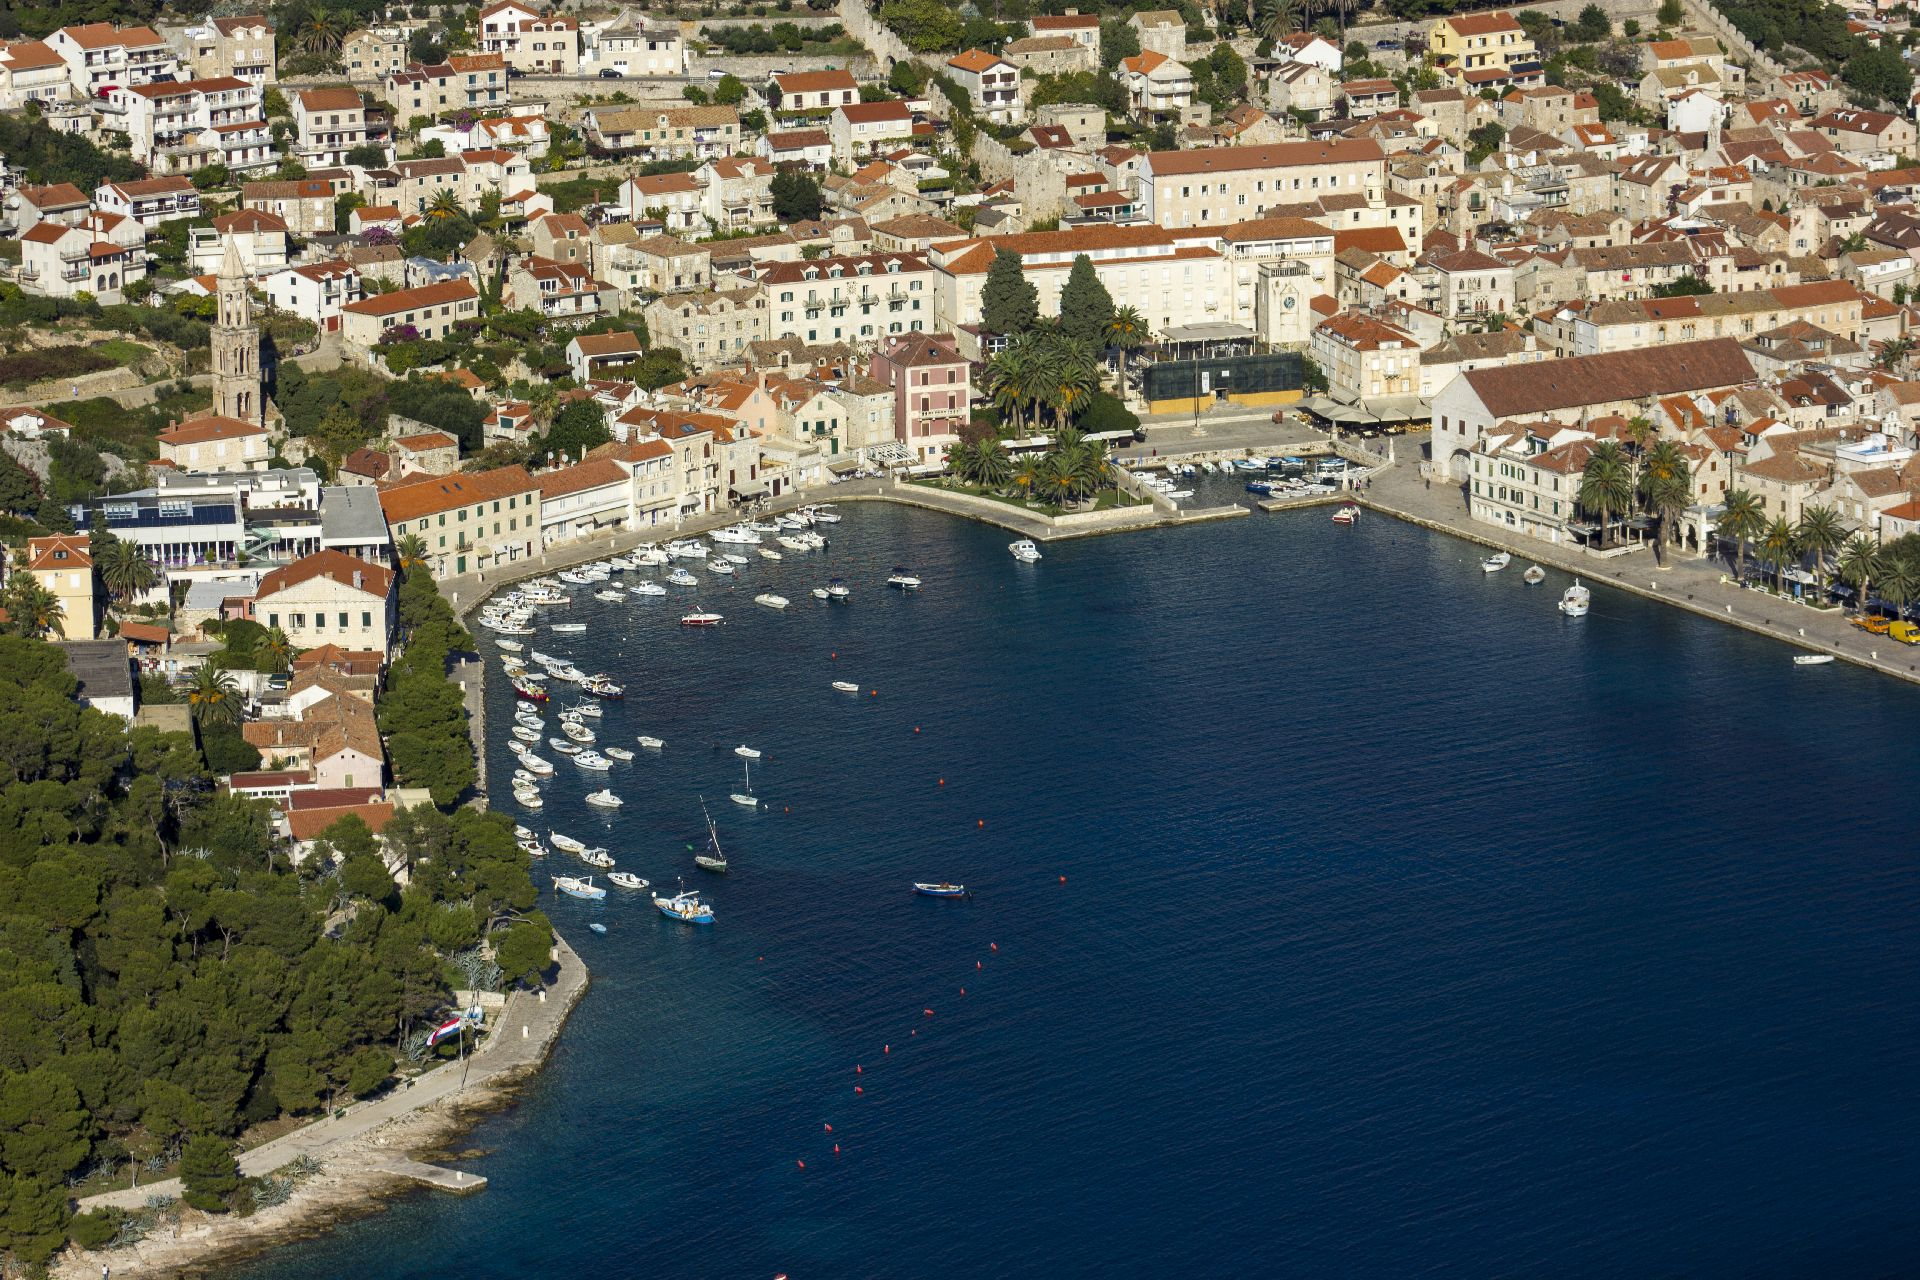 Photo Marko Kapitanovic - Split and Dalmatia County Tourist Board